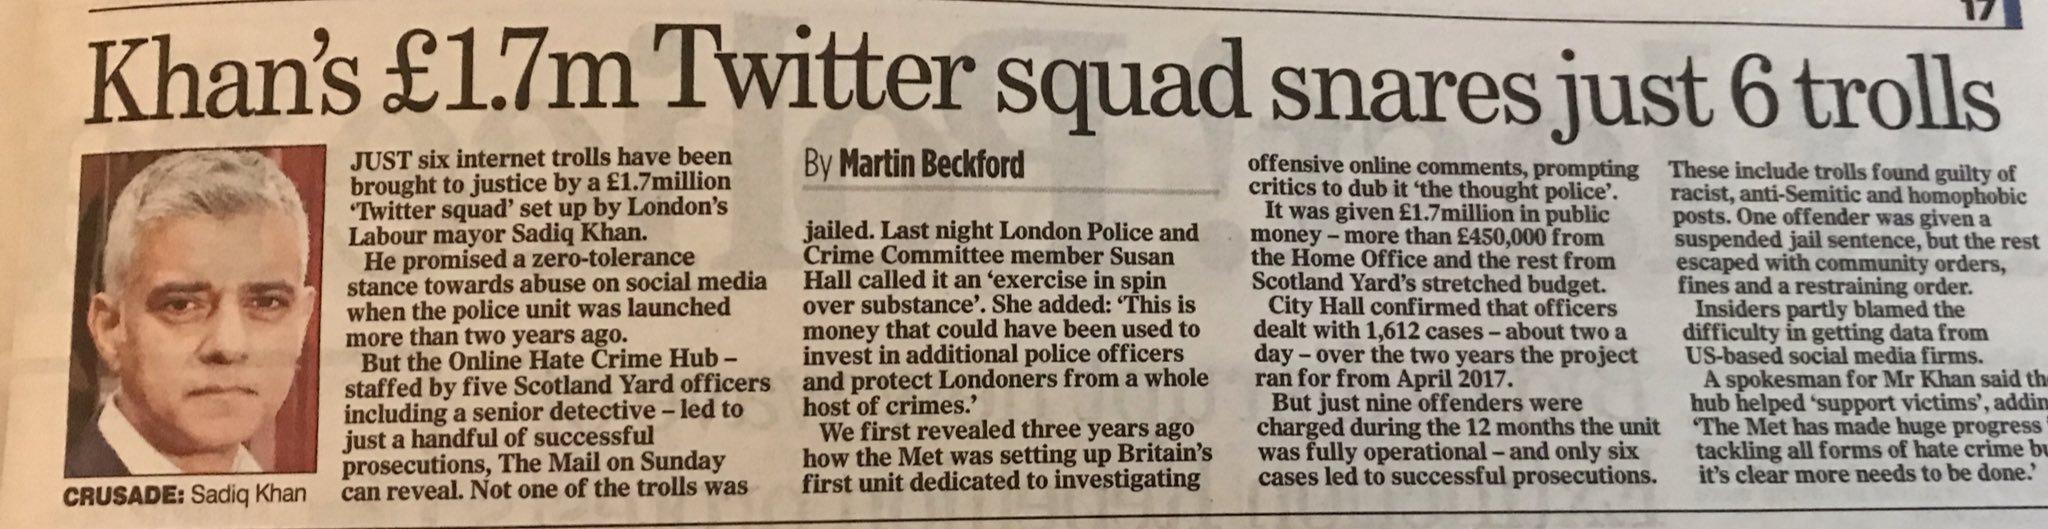 Sadiq Khan's £1.7m Twitter Squad snares just 6 trolls (none jailed) Khan10